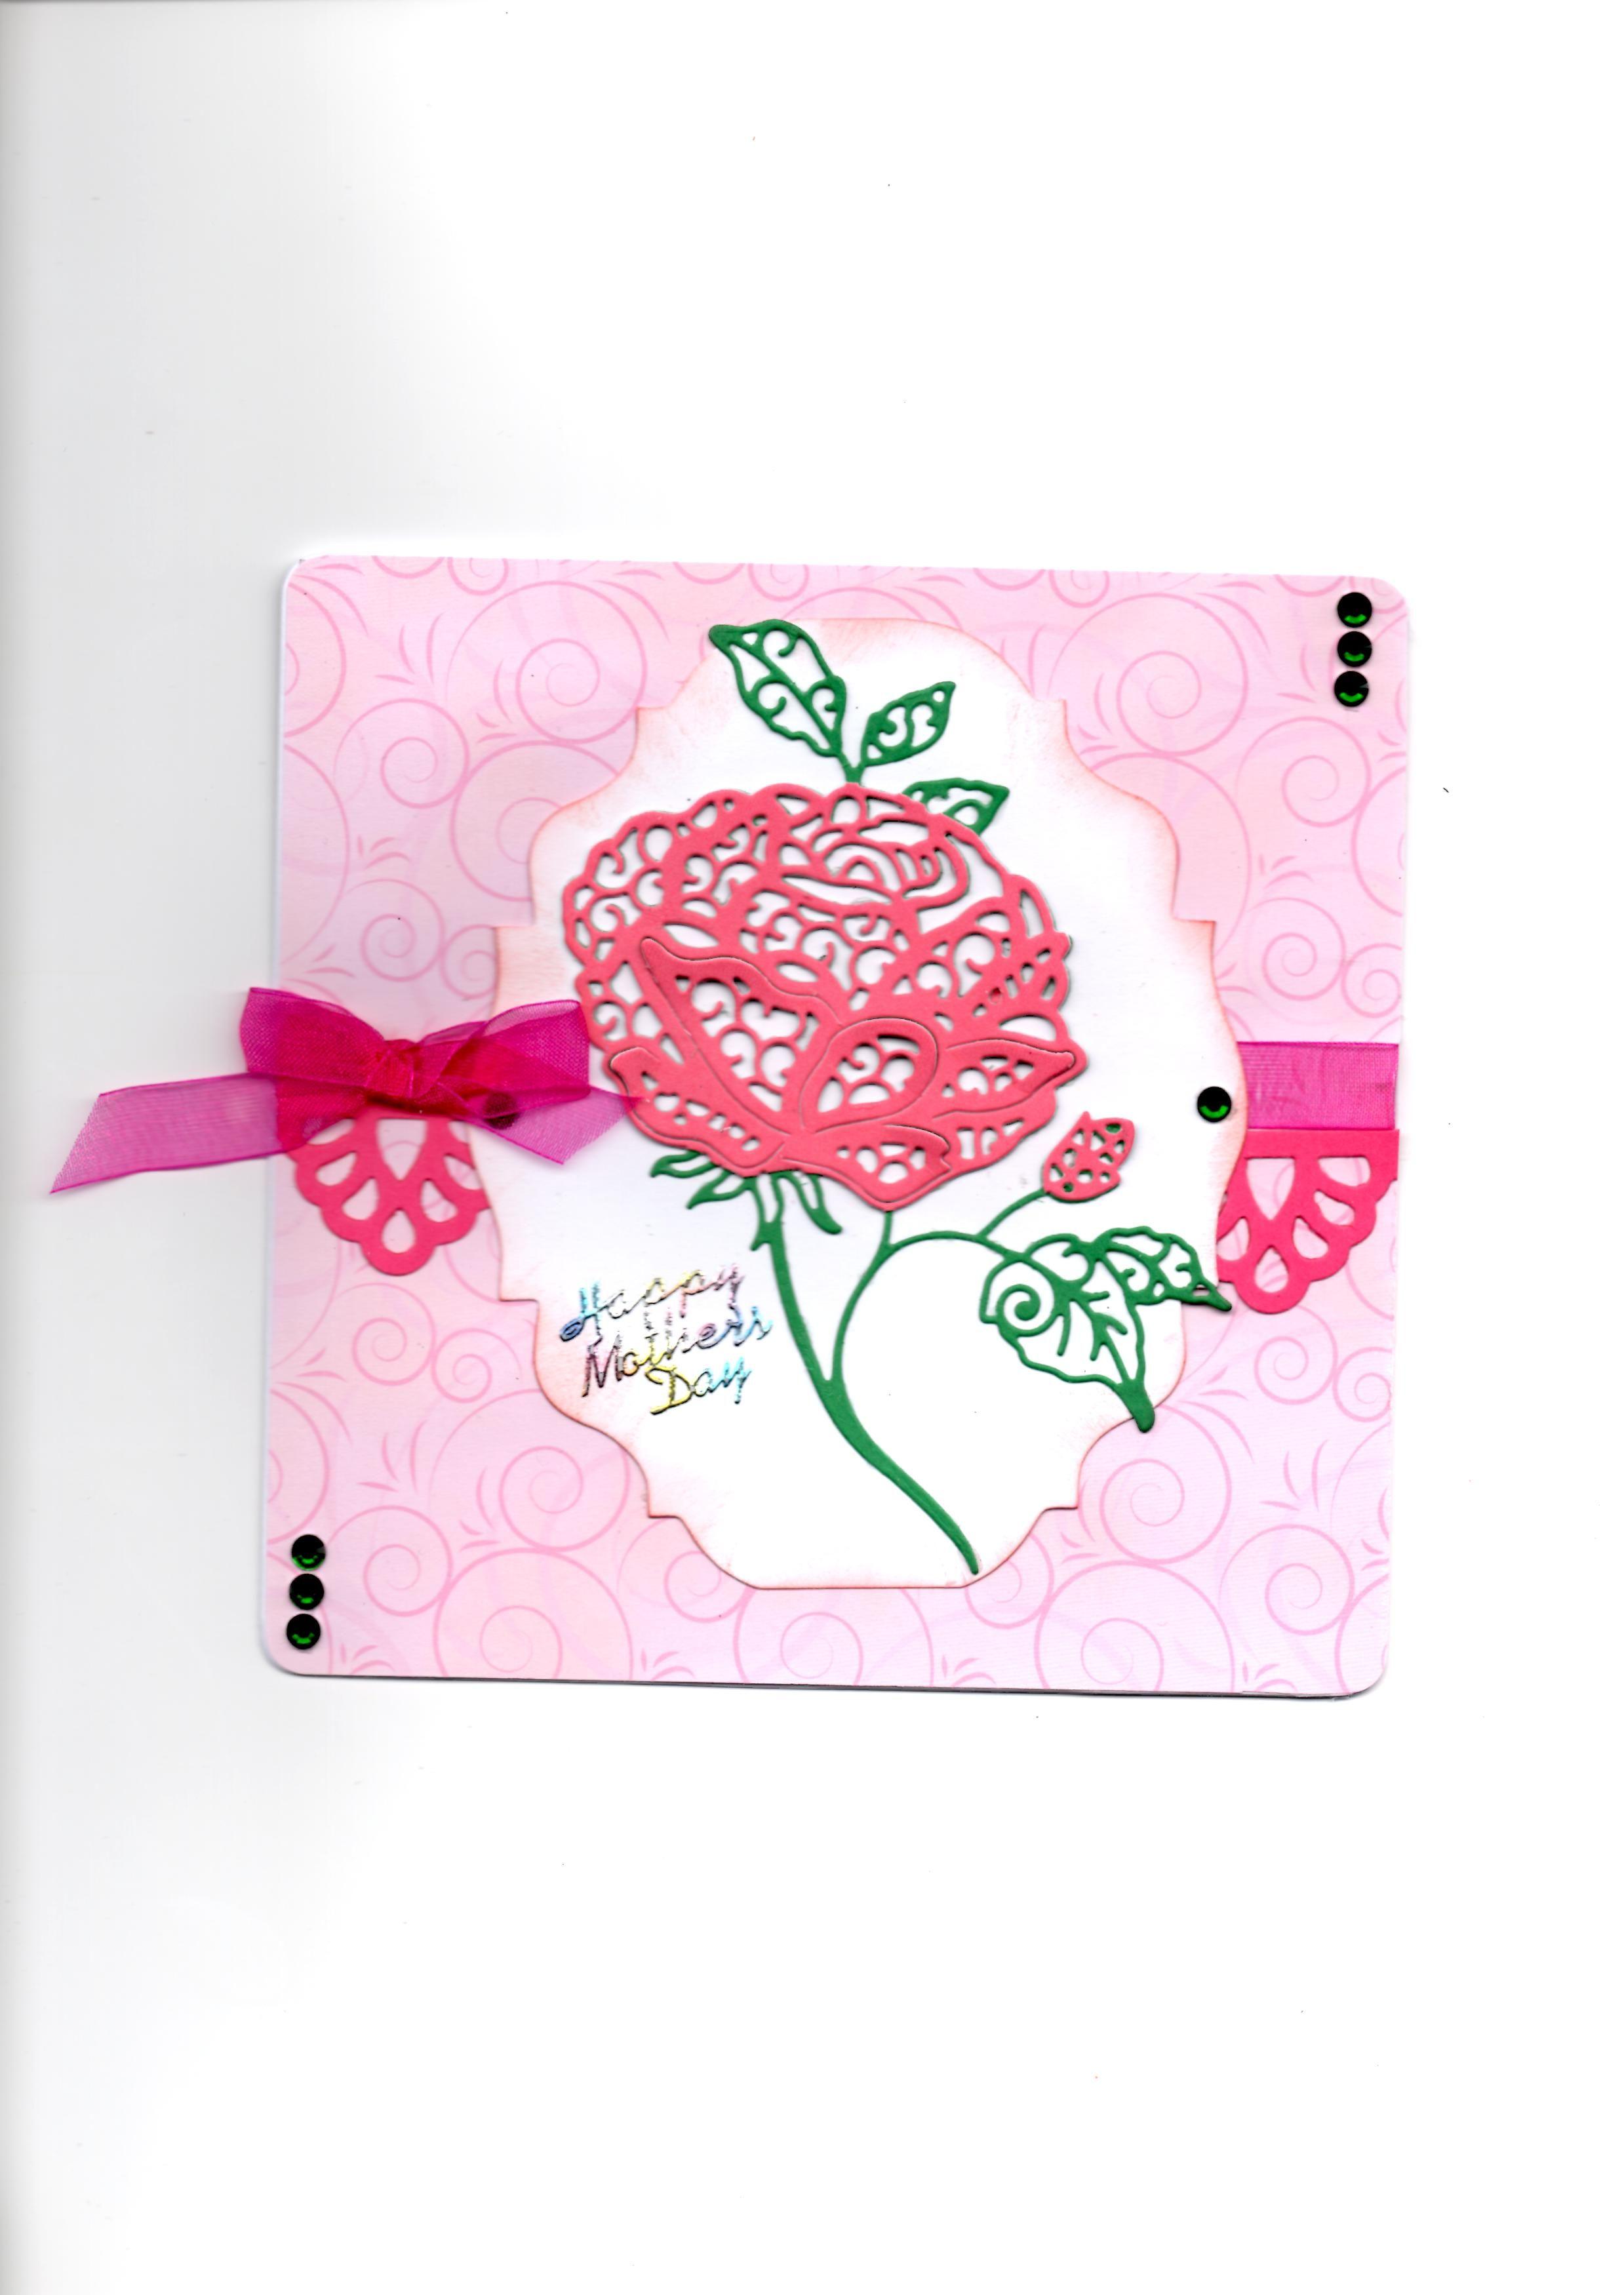 Tattered Lace Large english rose Tattered, Cut design